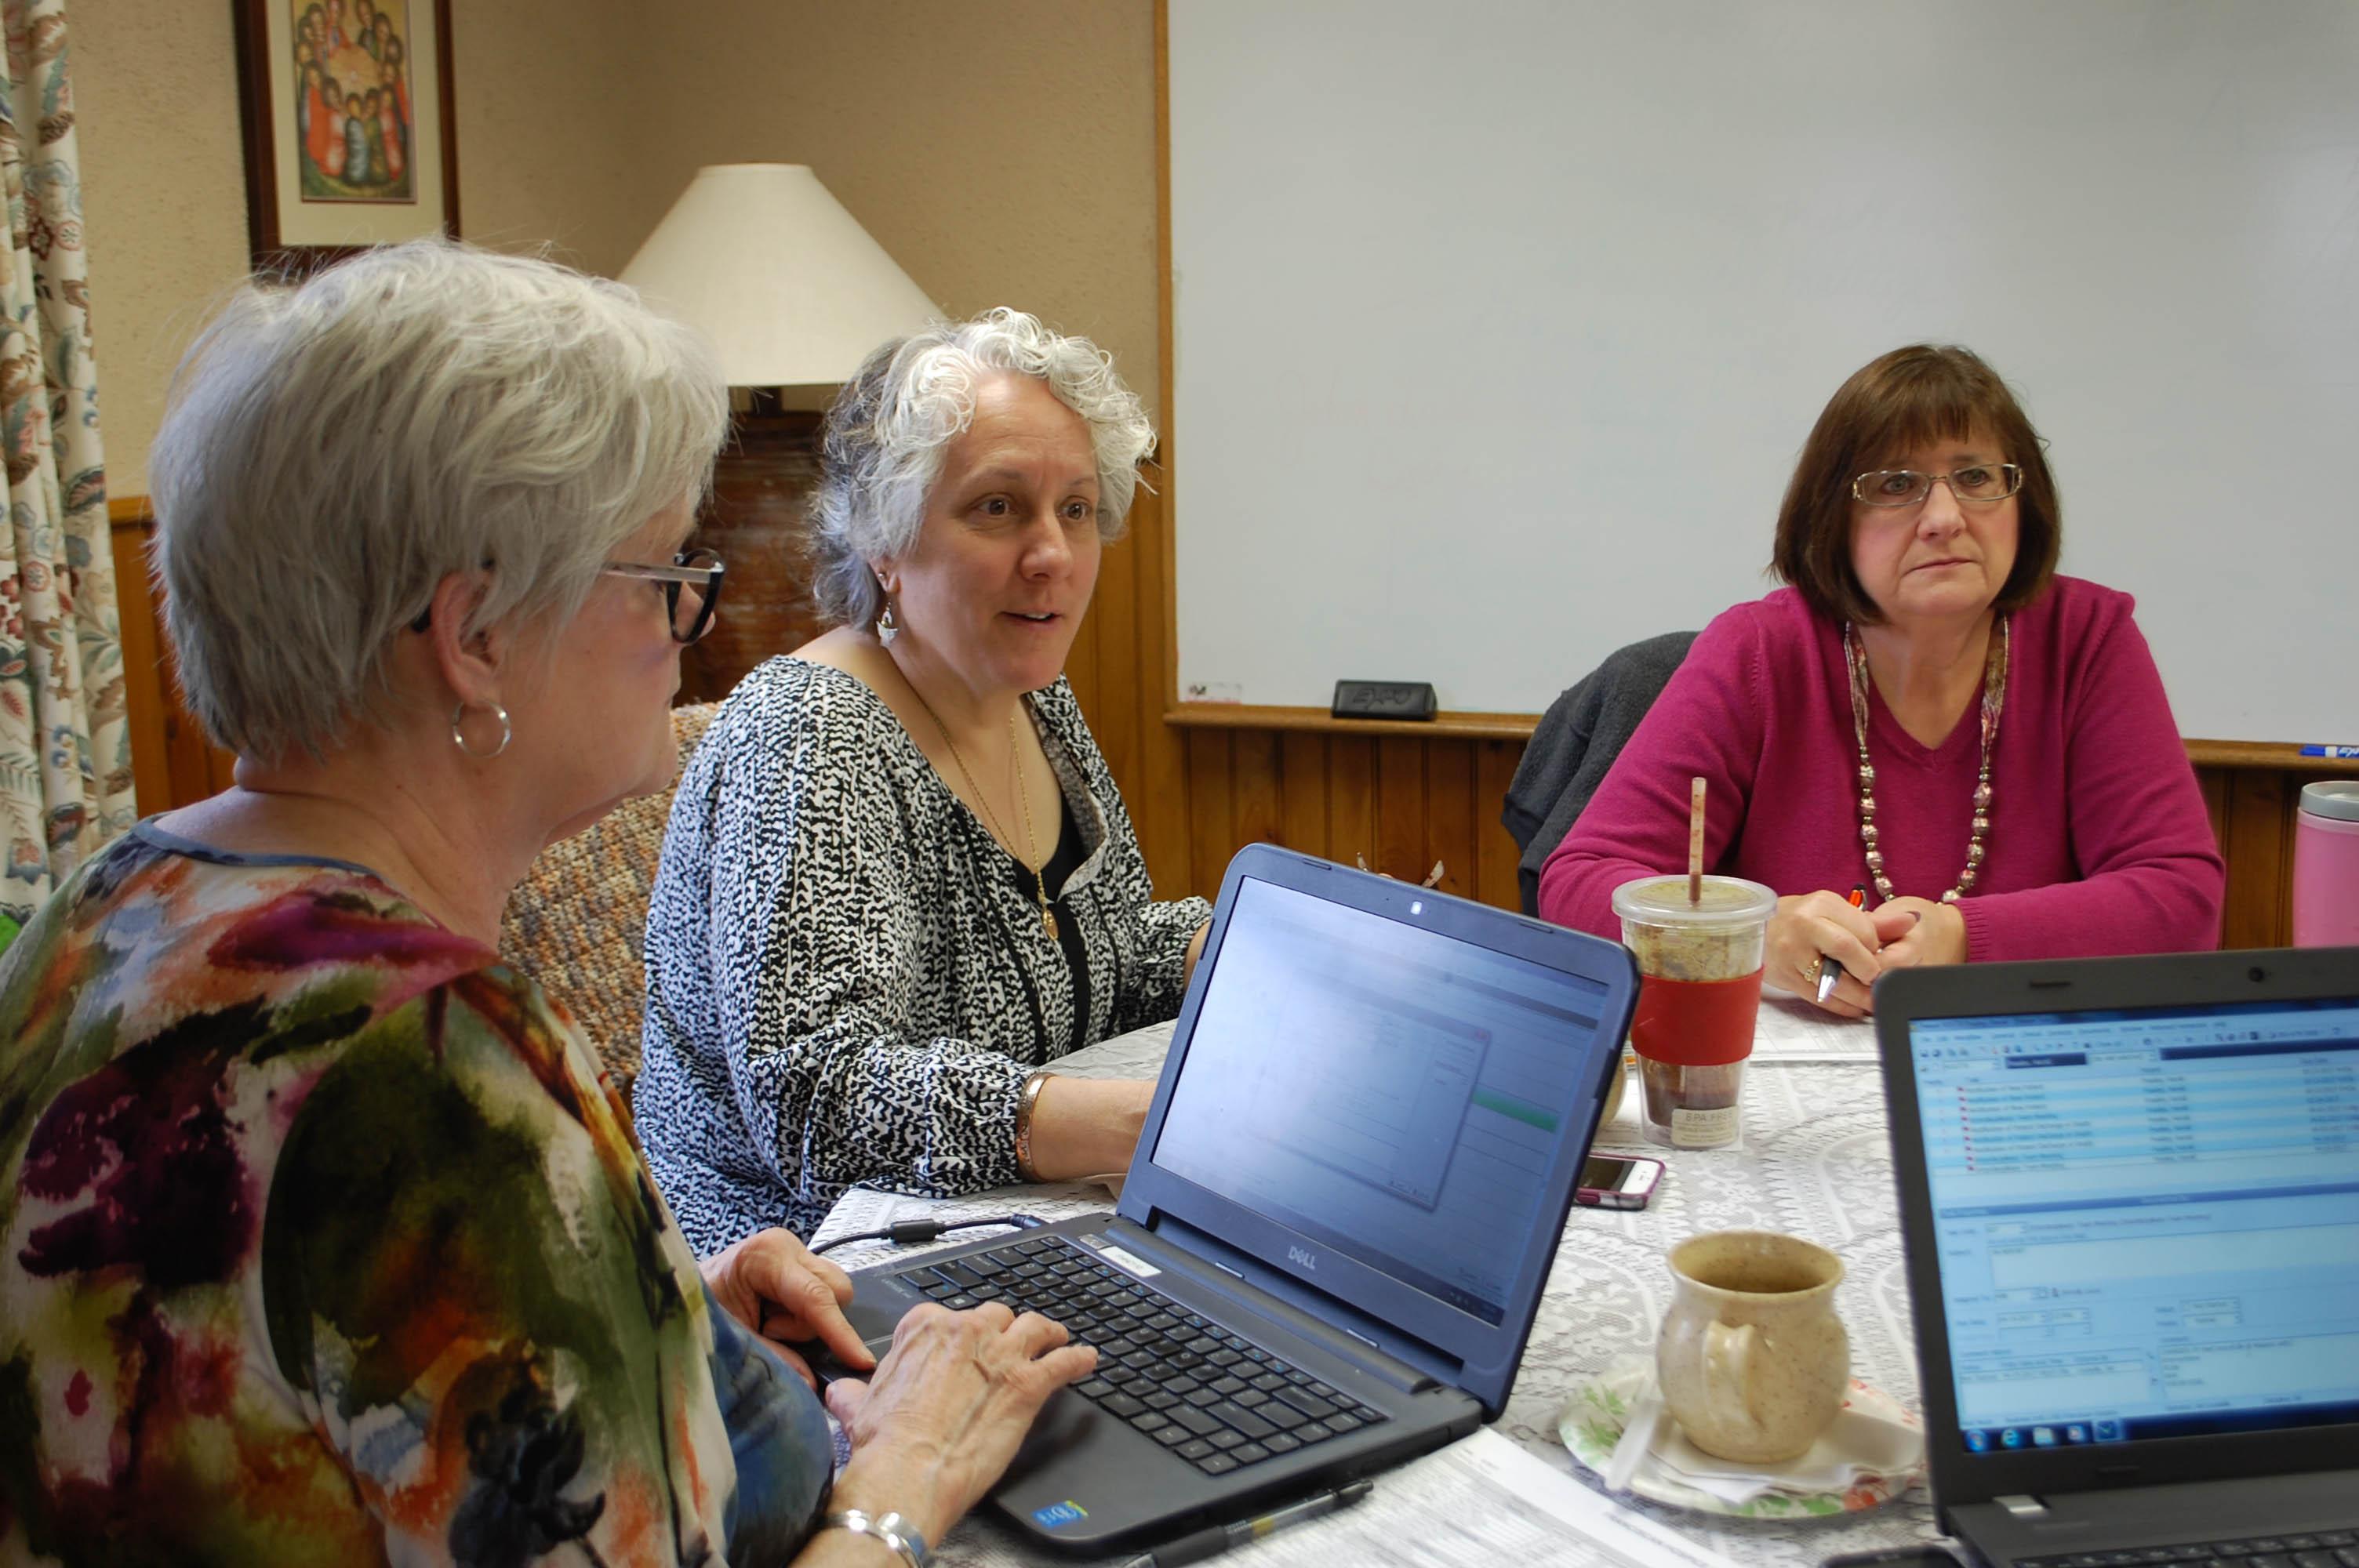 Hospice Care Interdisciplinary Team